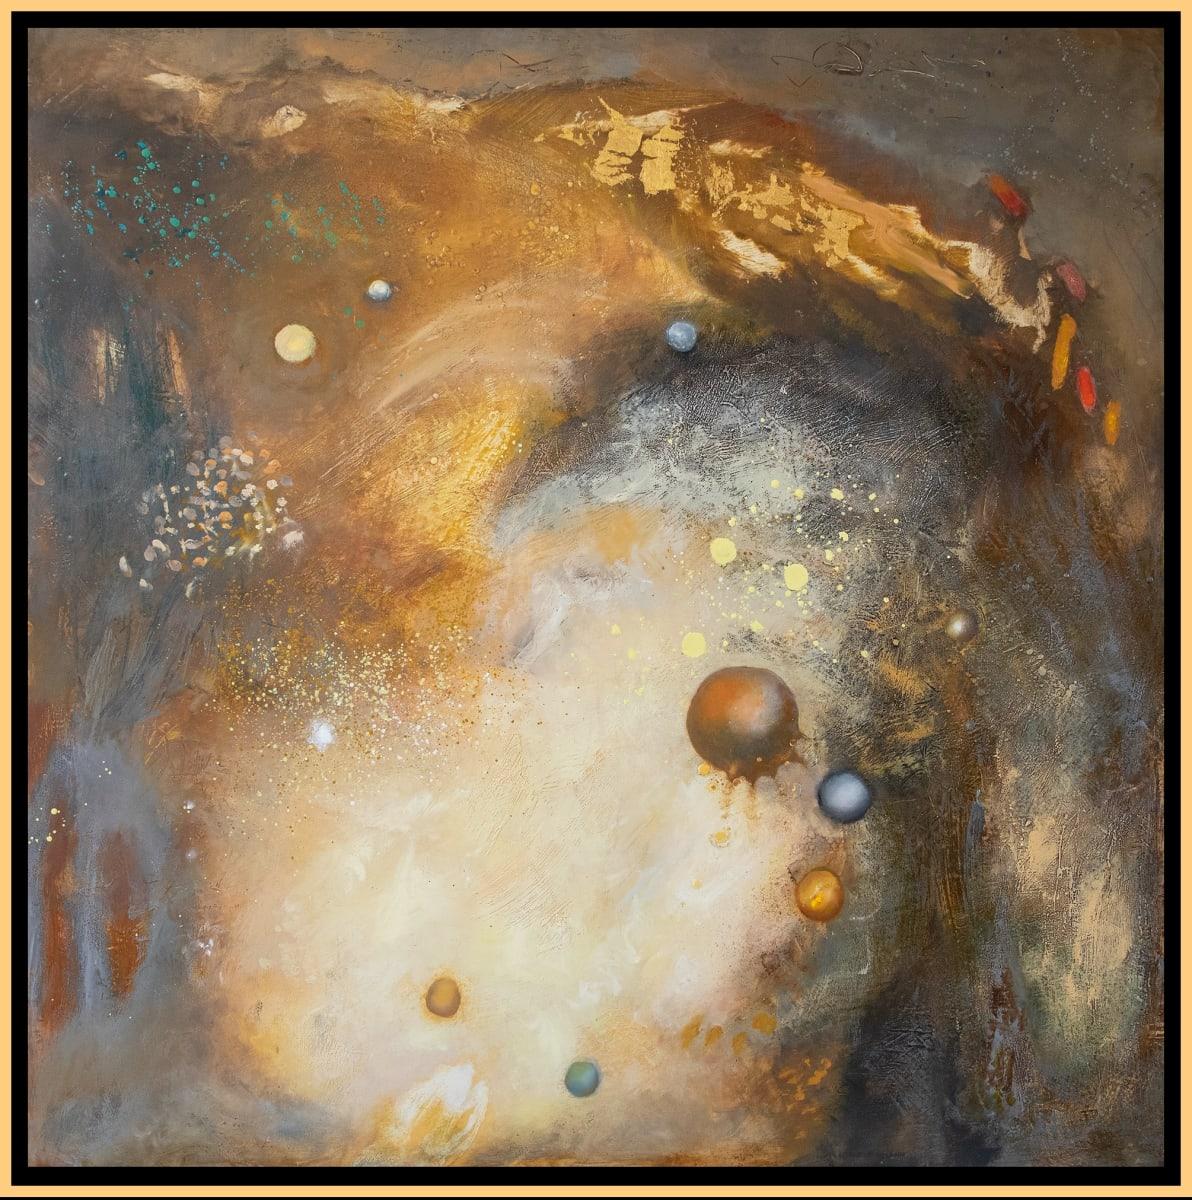 Celestial Cousins by Leslie Neumann